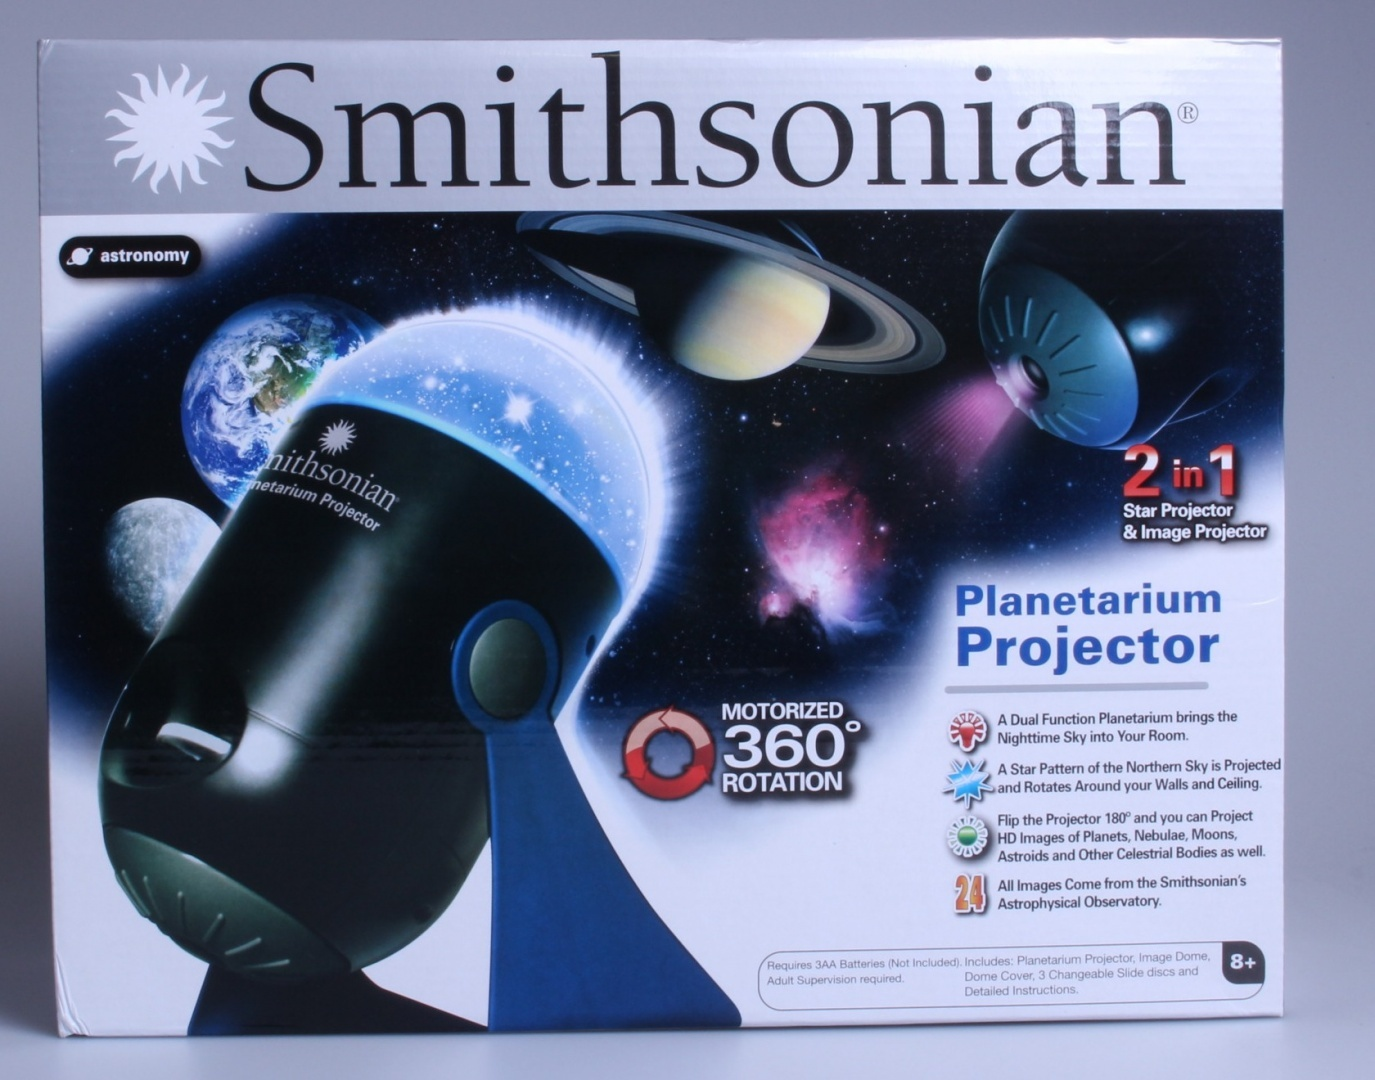 Smithsonian Optics Room Planetarium and Projector